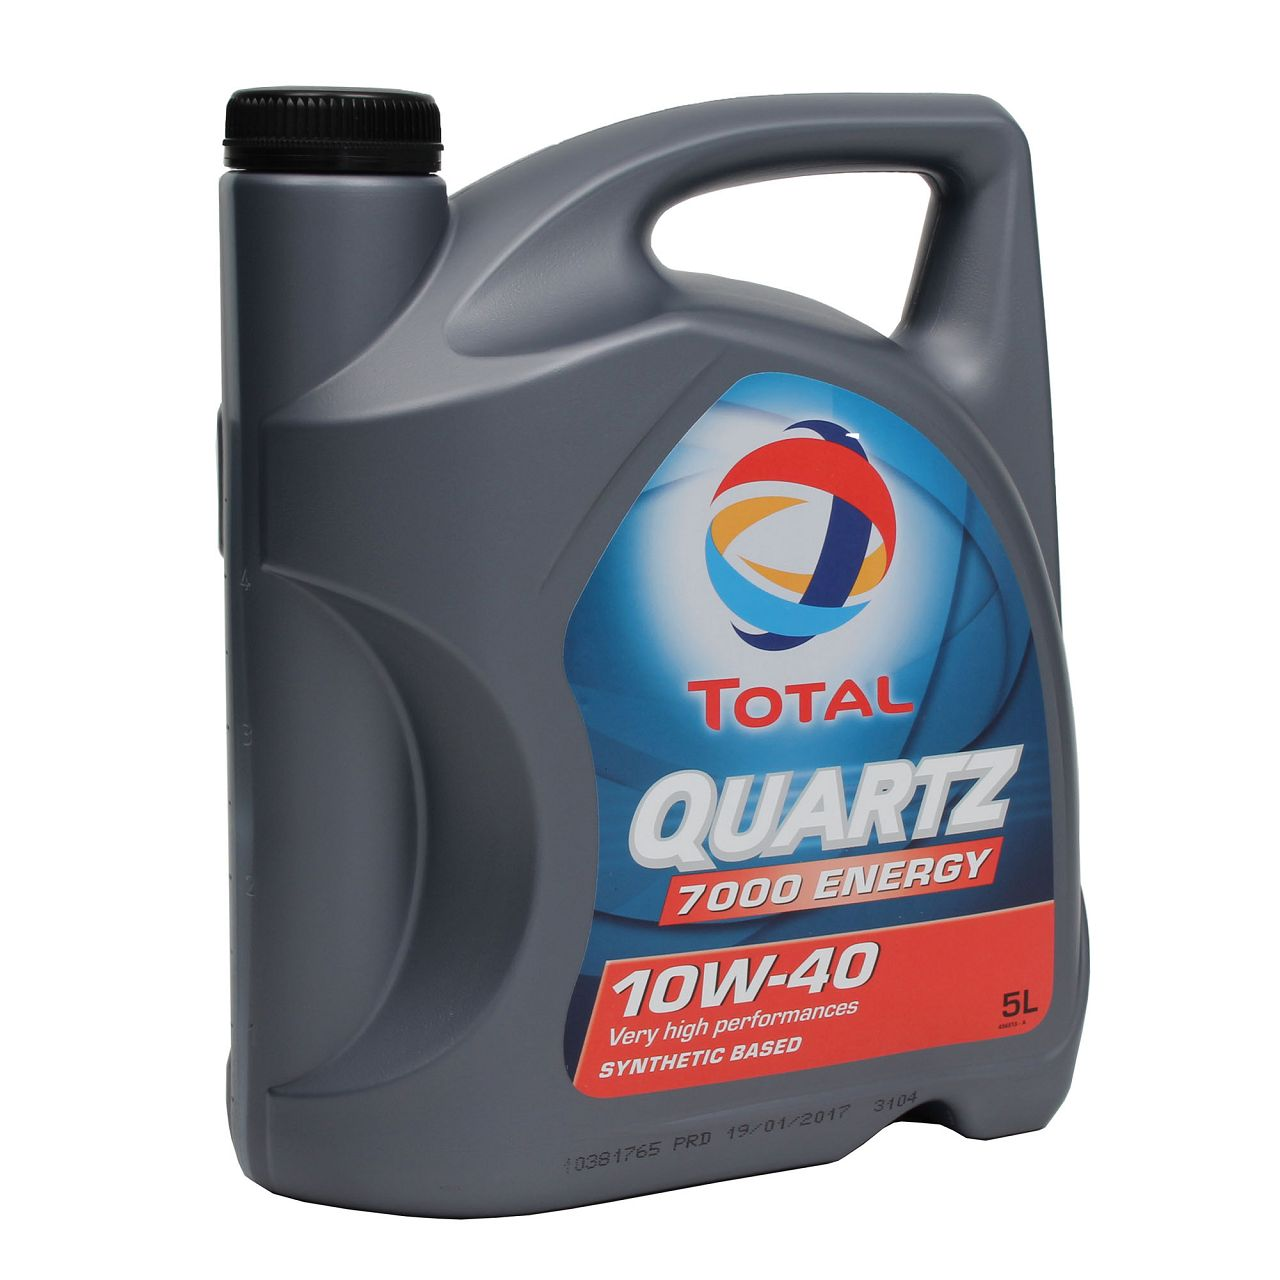 TOTAL QUARTZ 7000 ENERGY 10W-40 Motoröl 5L 10W40 5 Liter für VW 501.01/505.00